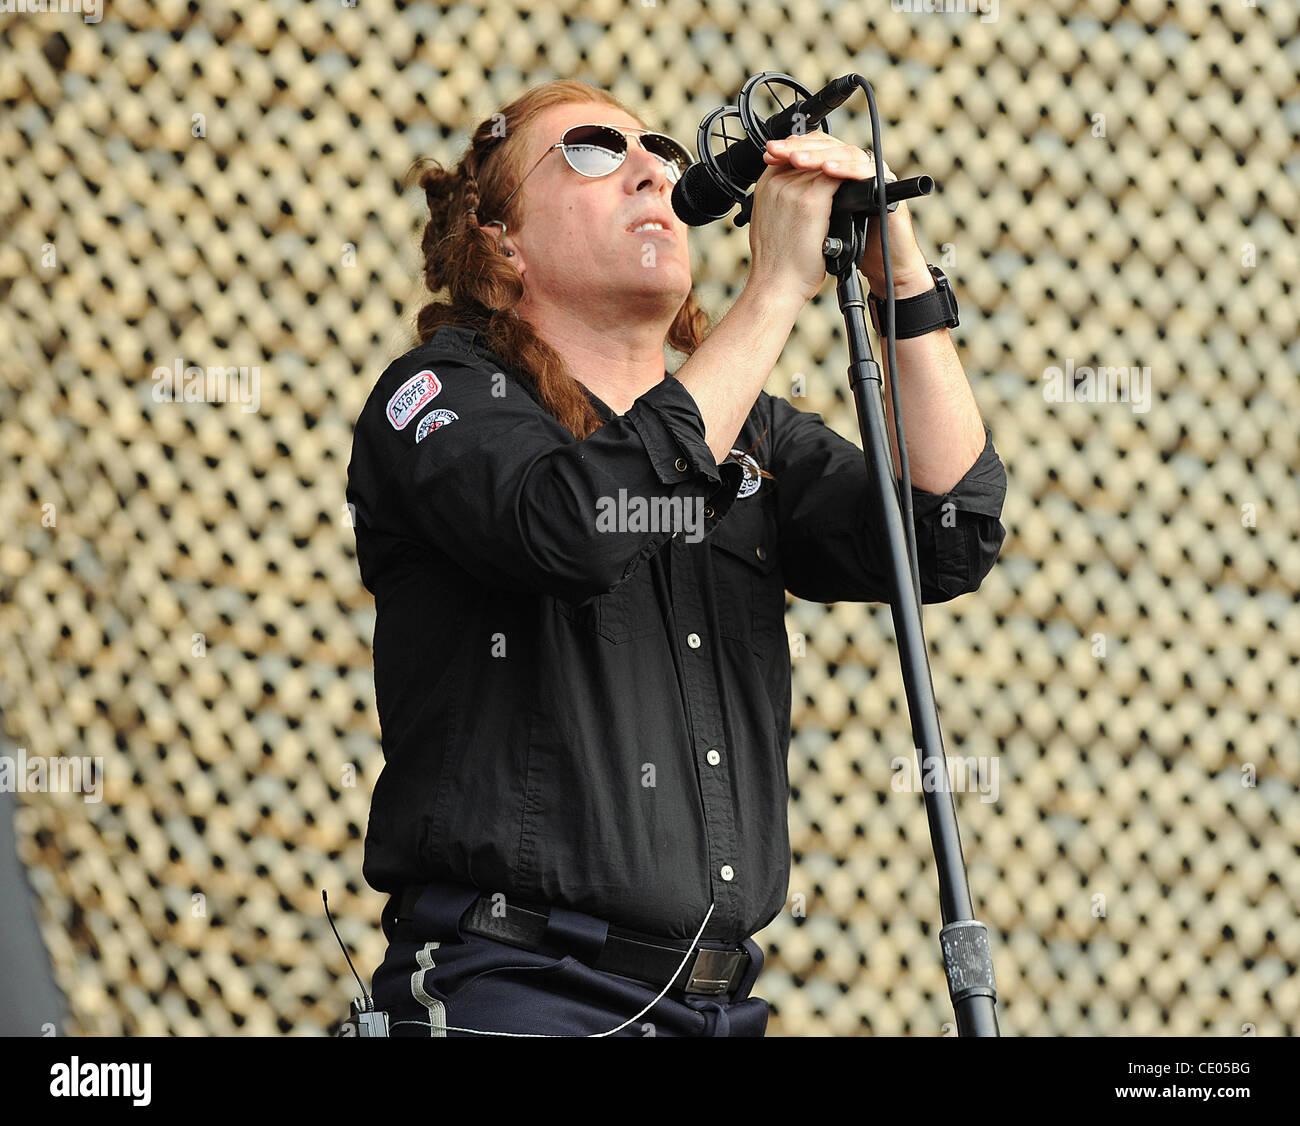 Aug 5, 2011 - Chicago, Illinois; USA - Singer MAYNARD JAMES KEENAN of the band A Perfect Circle performs live as - Stock Image